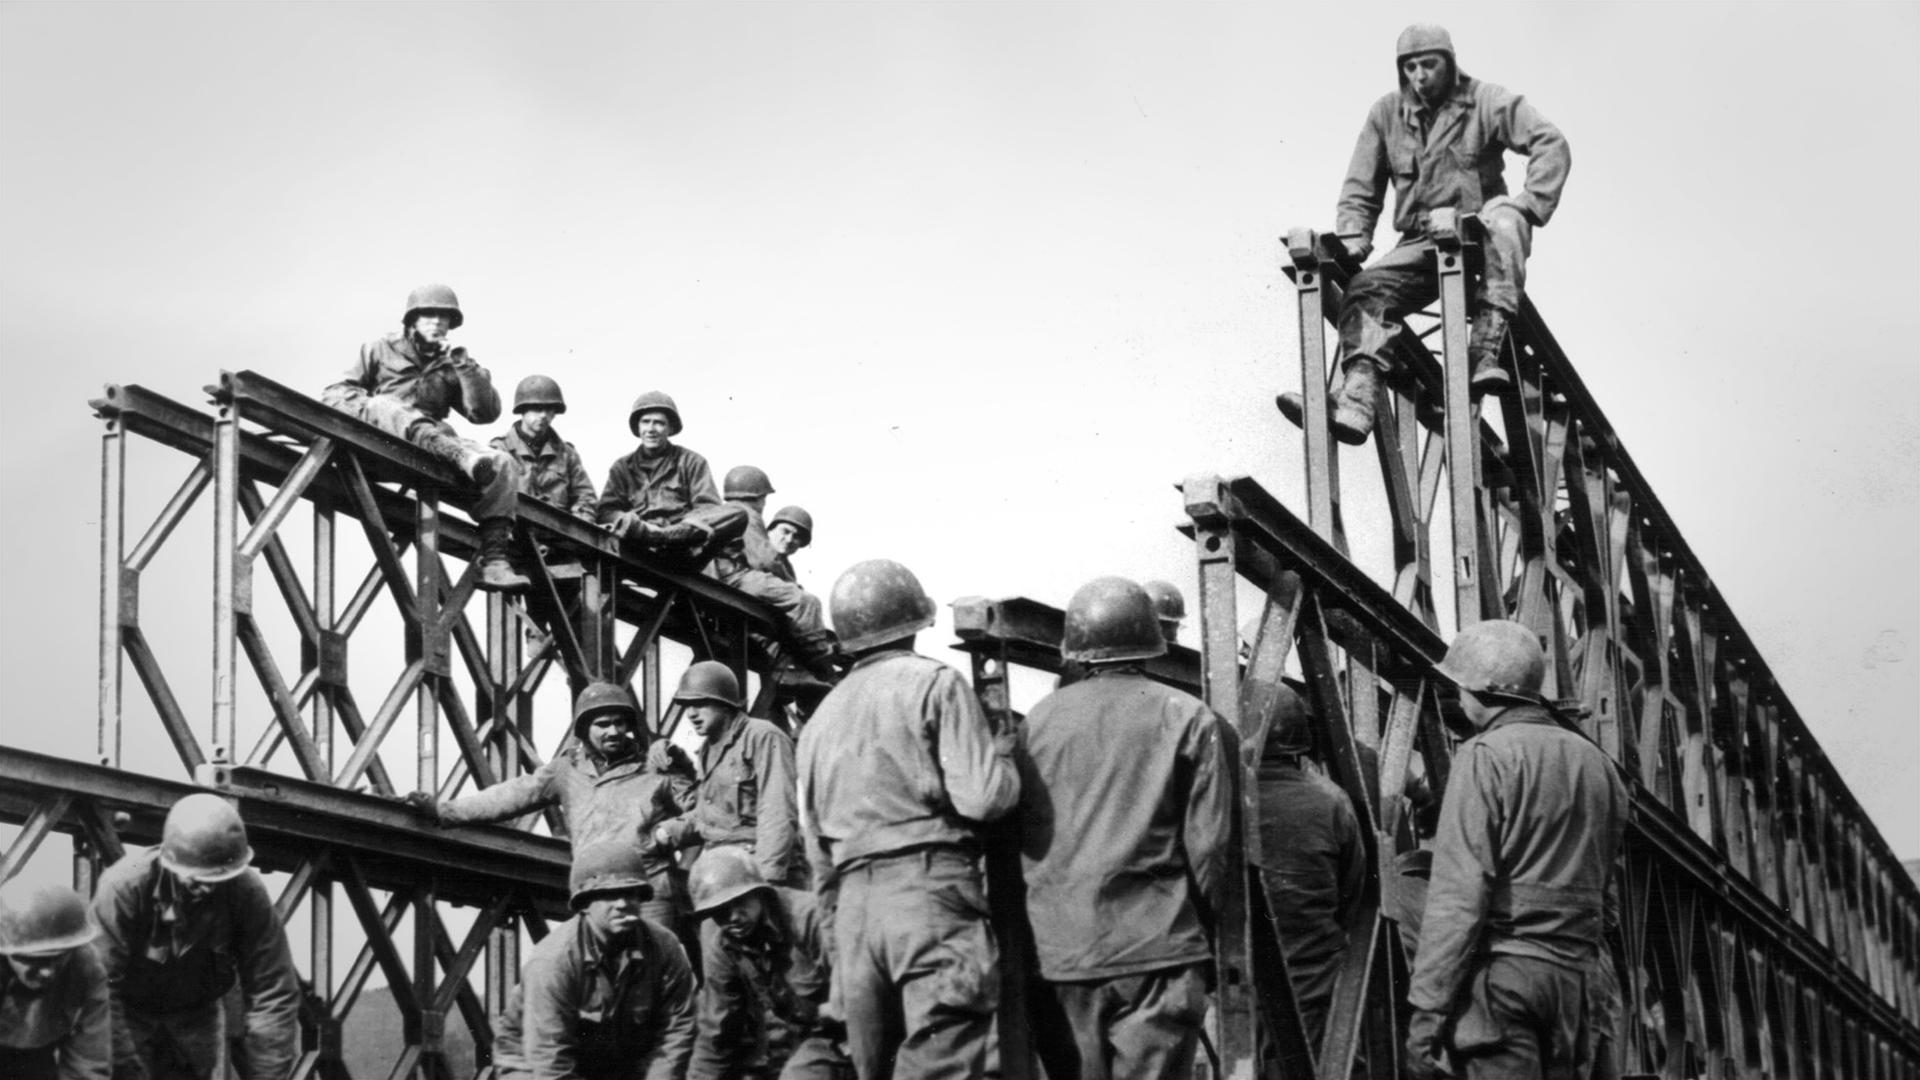 A Bailey bridge in use during World War II